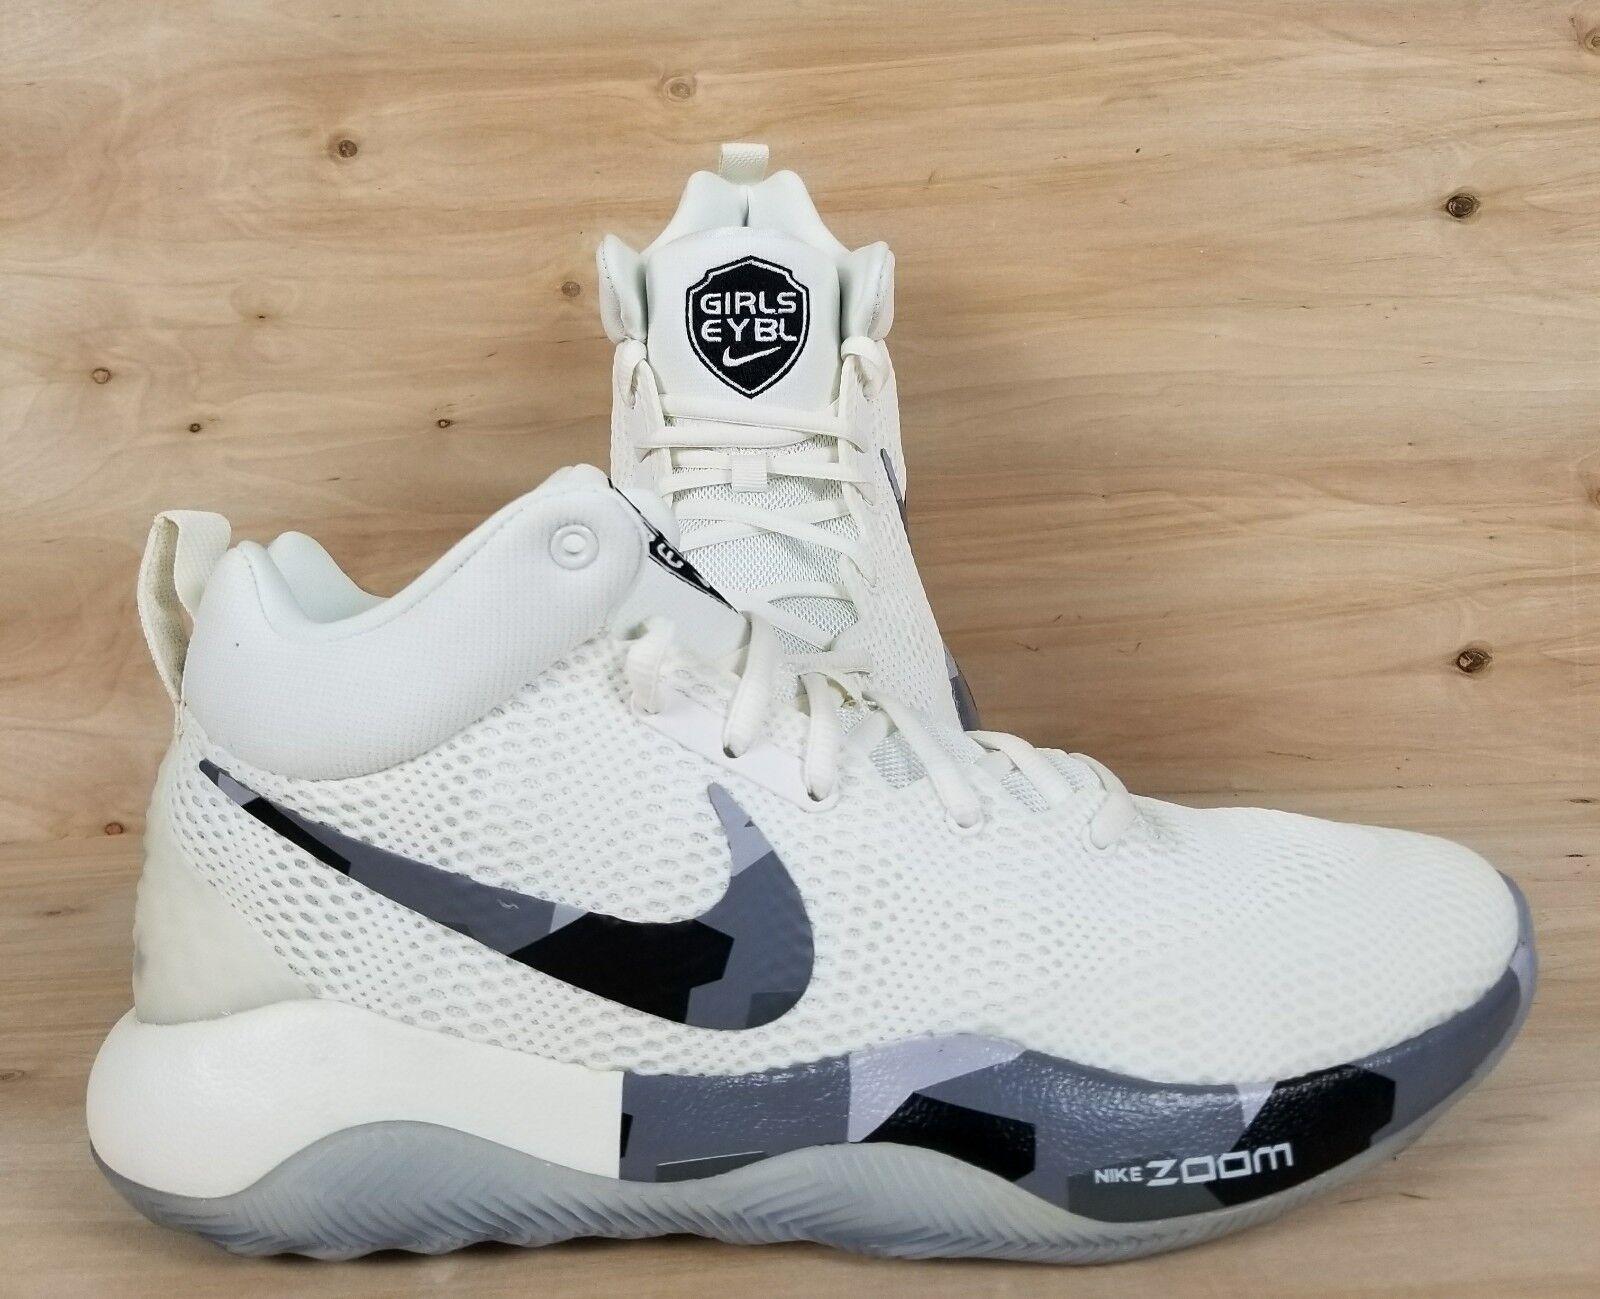 Nike zoom riv campione ragazze eybl ep promo campione riv scarpe da basket [100] aa3419 uomini sz: dbf8df